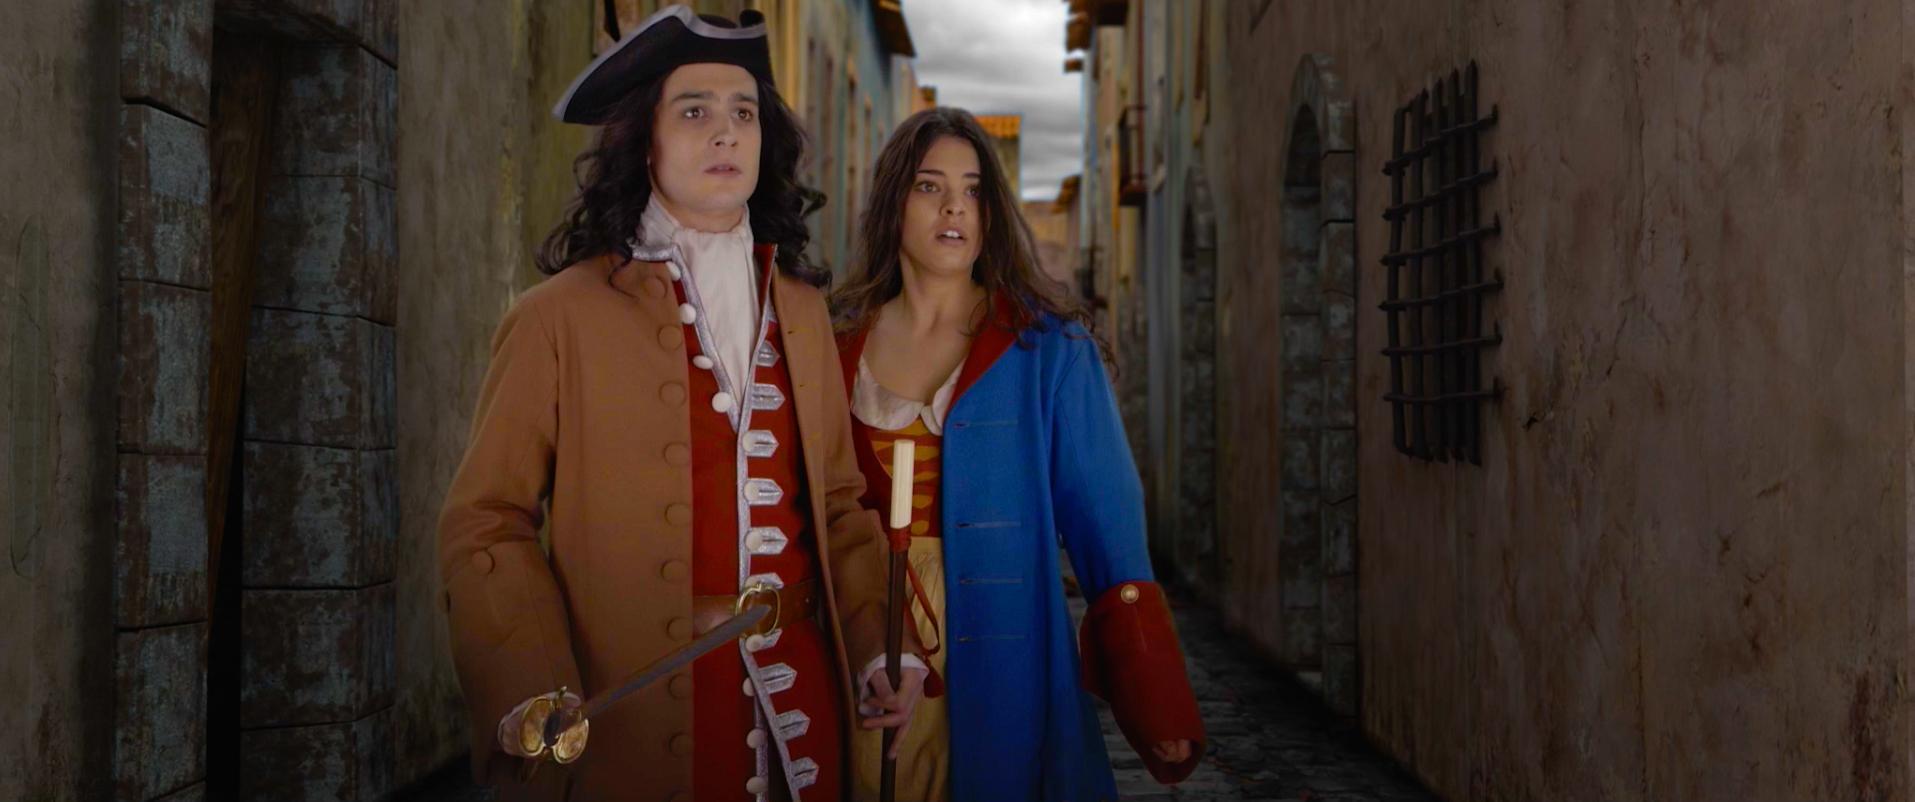 Barcelona 1714 obrirà el 12è FIC-CAT